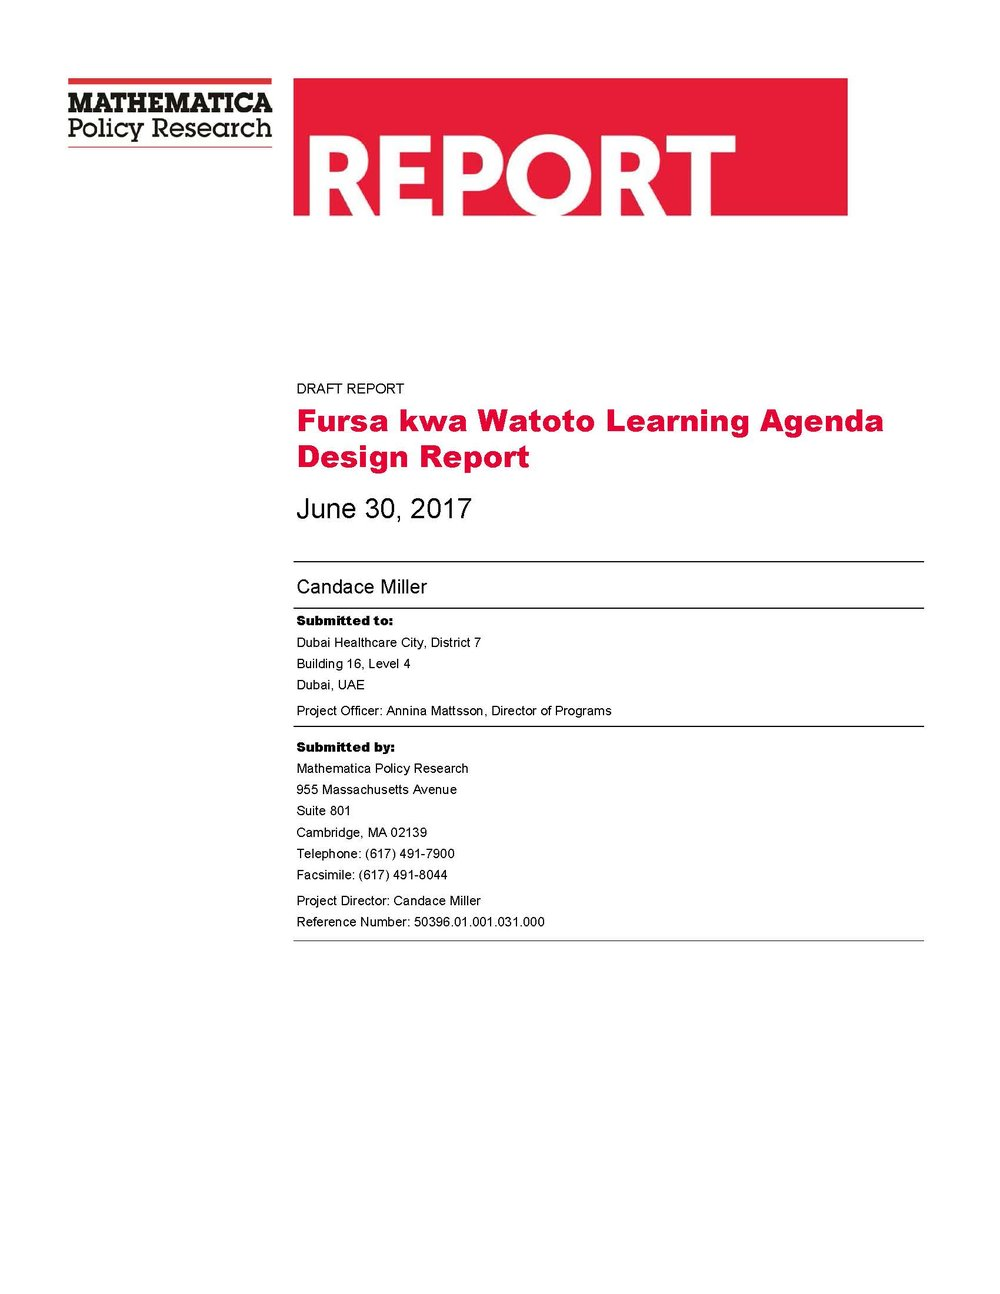 Learning Agenda Design Report